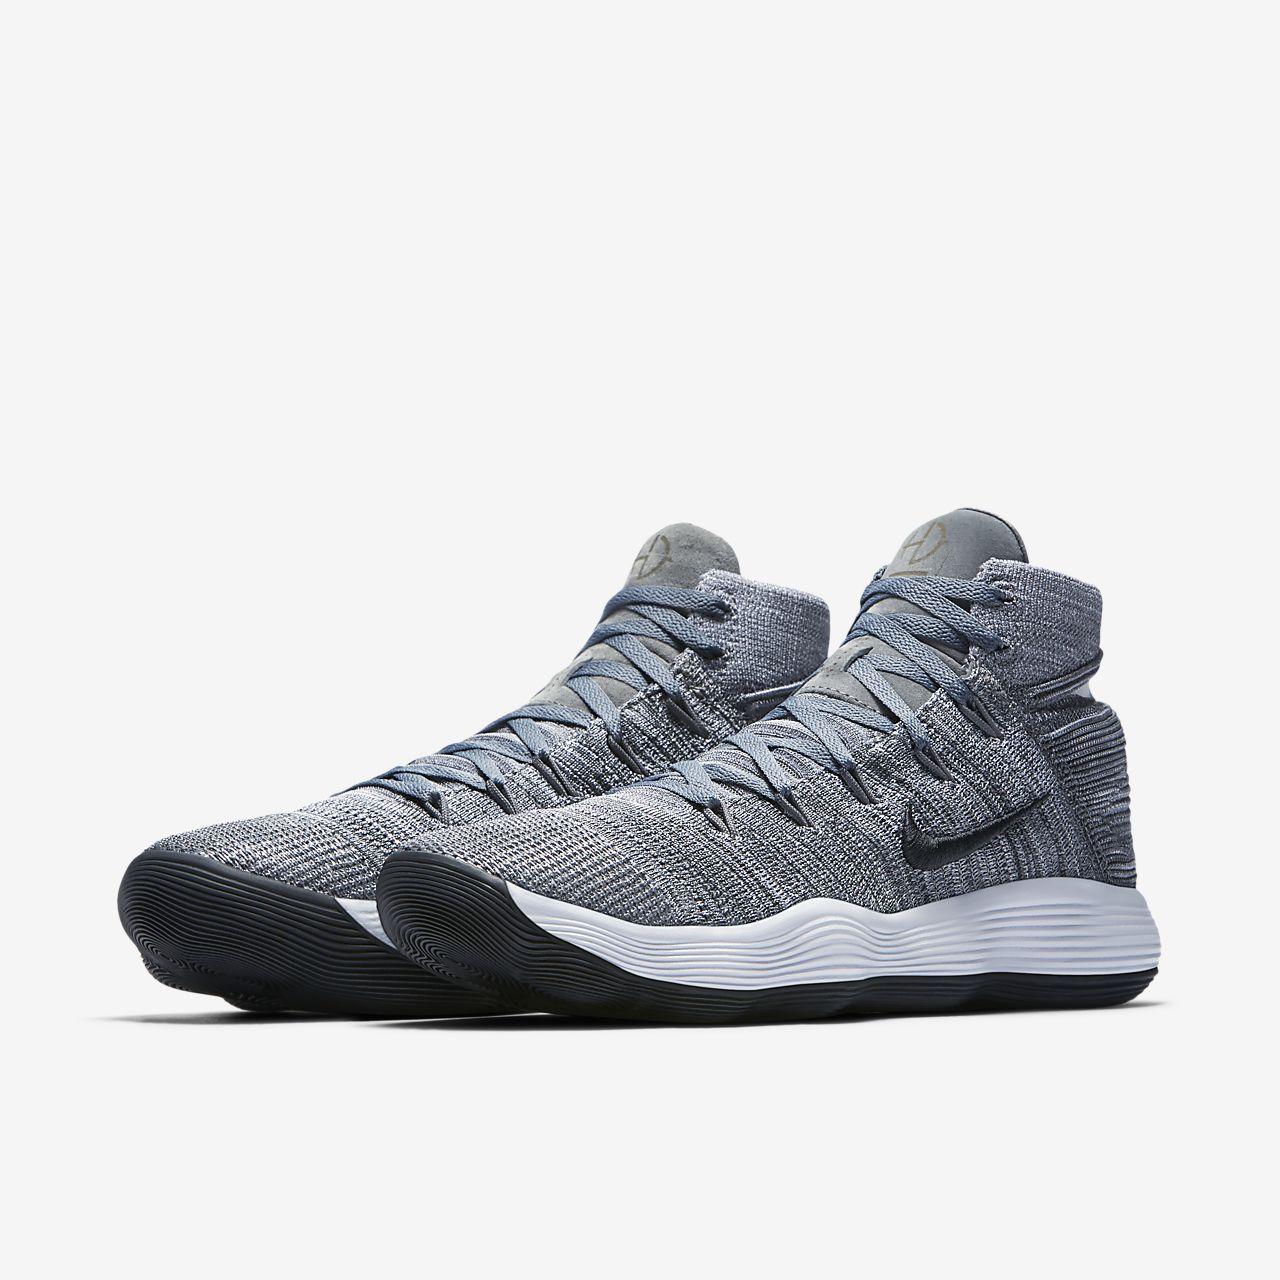 sale retailer 75c25 c1731 Nike React Hyperdunk 2017 Flyknit Basketball Shoe